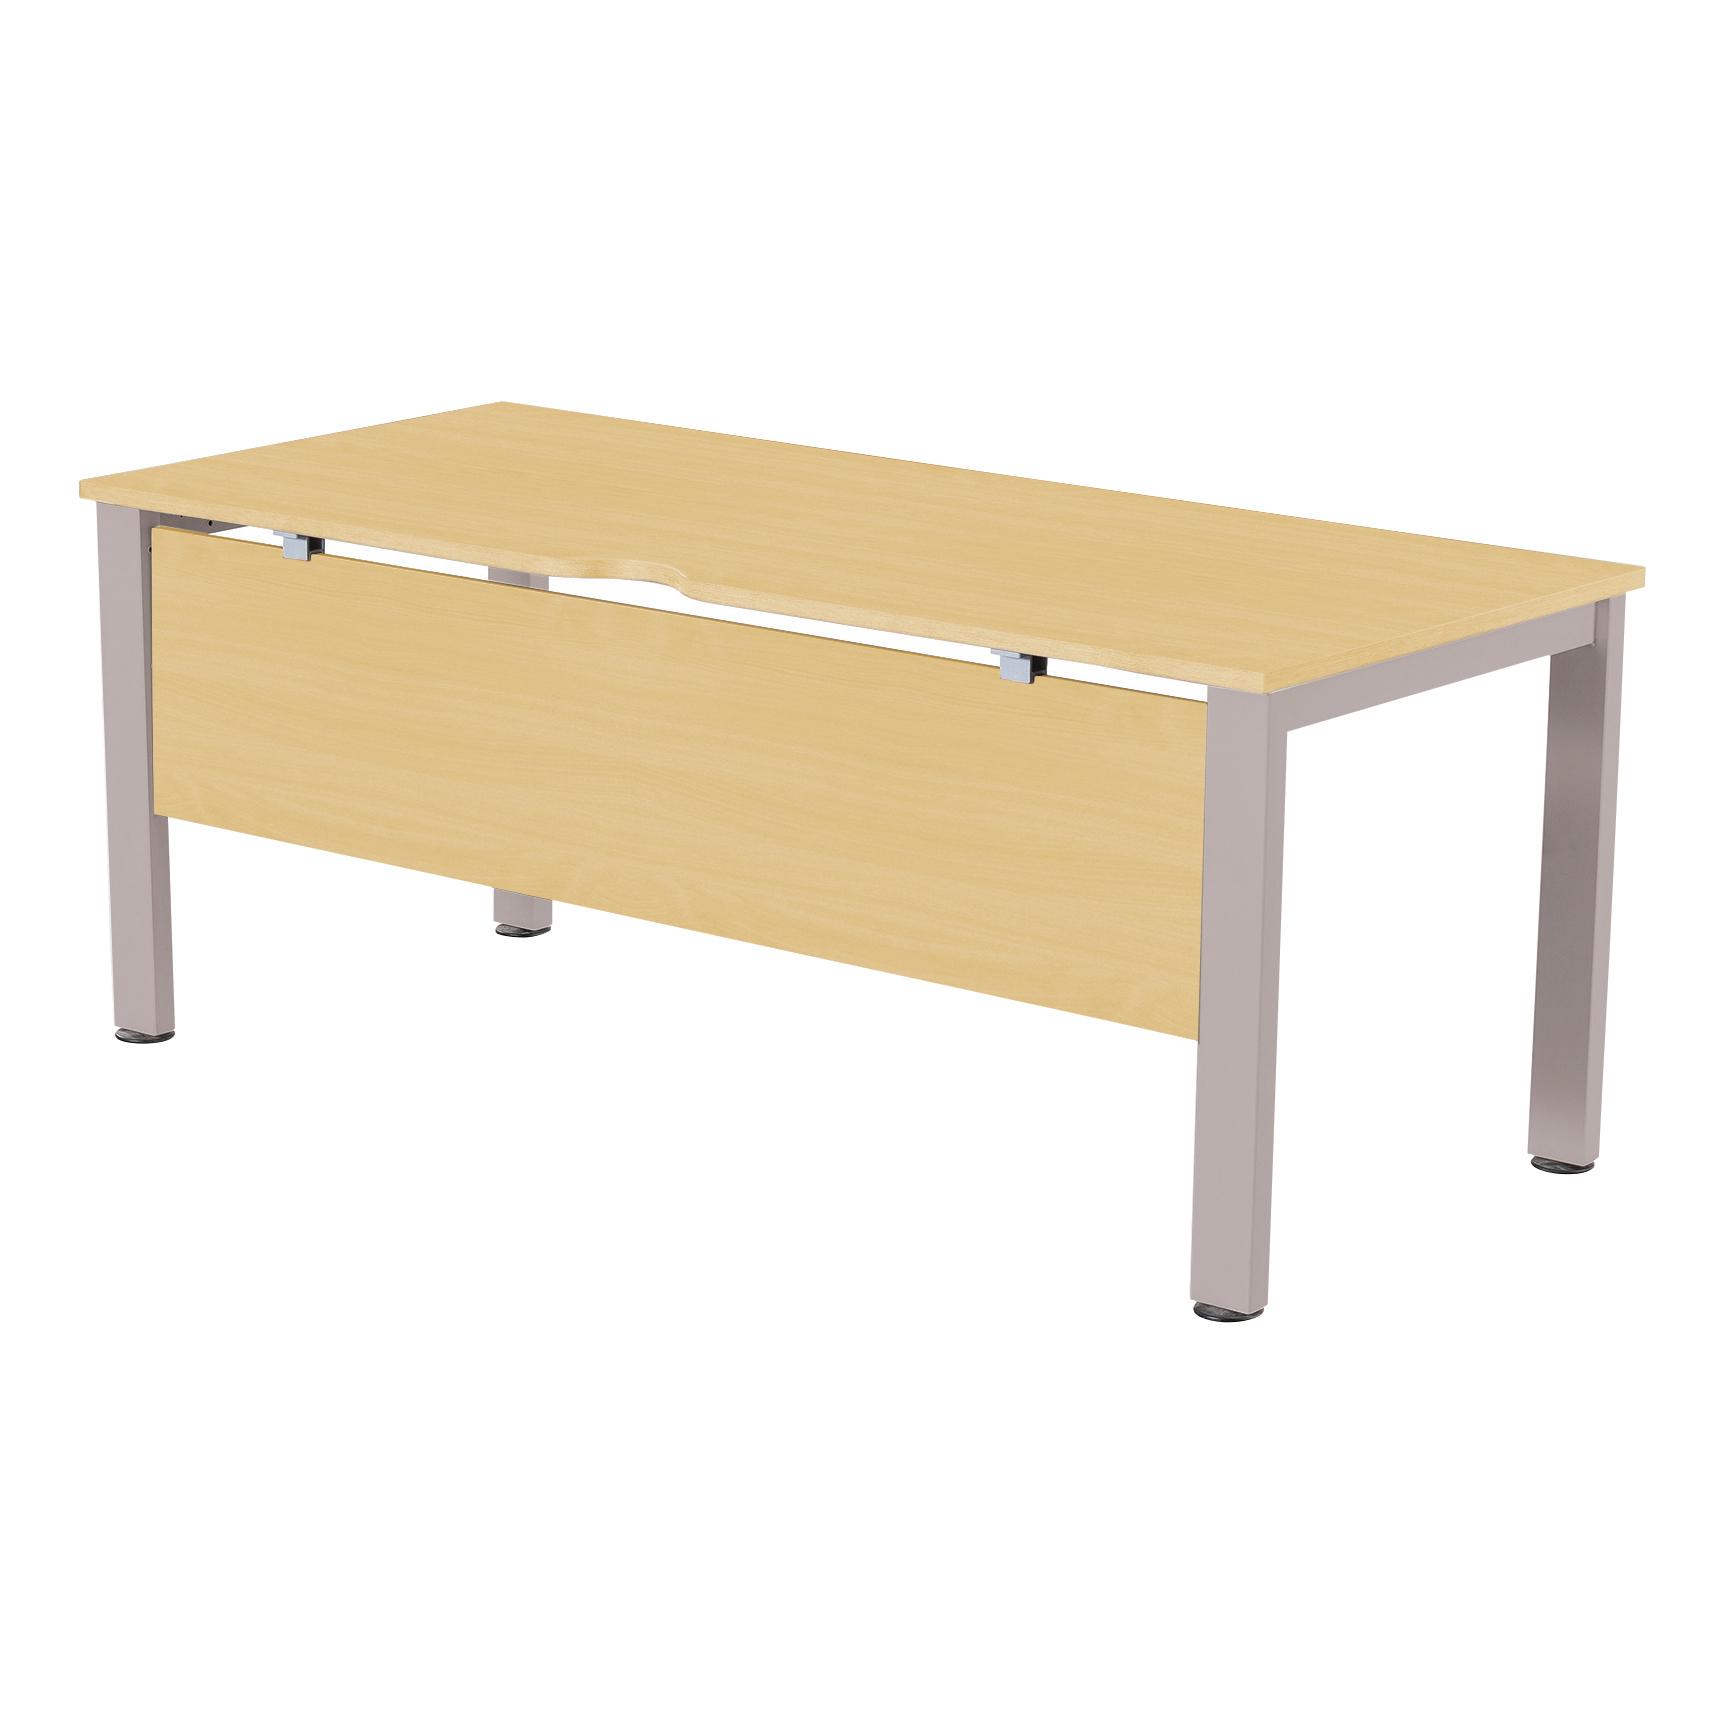 Sonix Standalone Desk Silver Legs 1600x800mm Acer Maple Ref fbcsmw16-1m